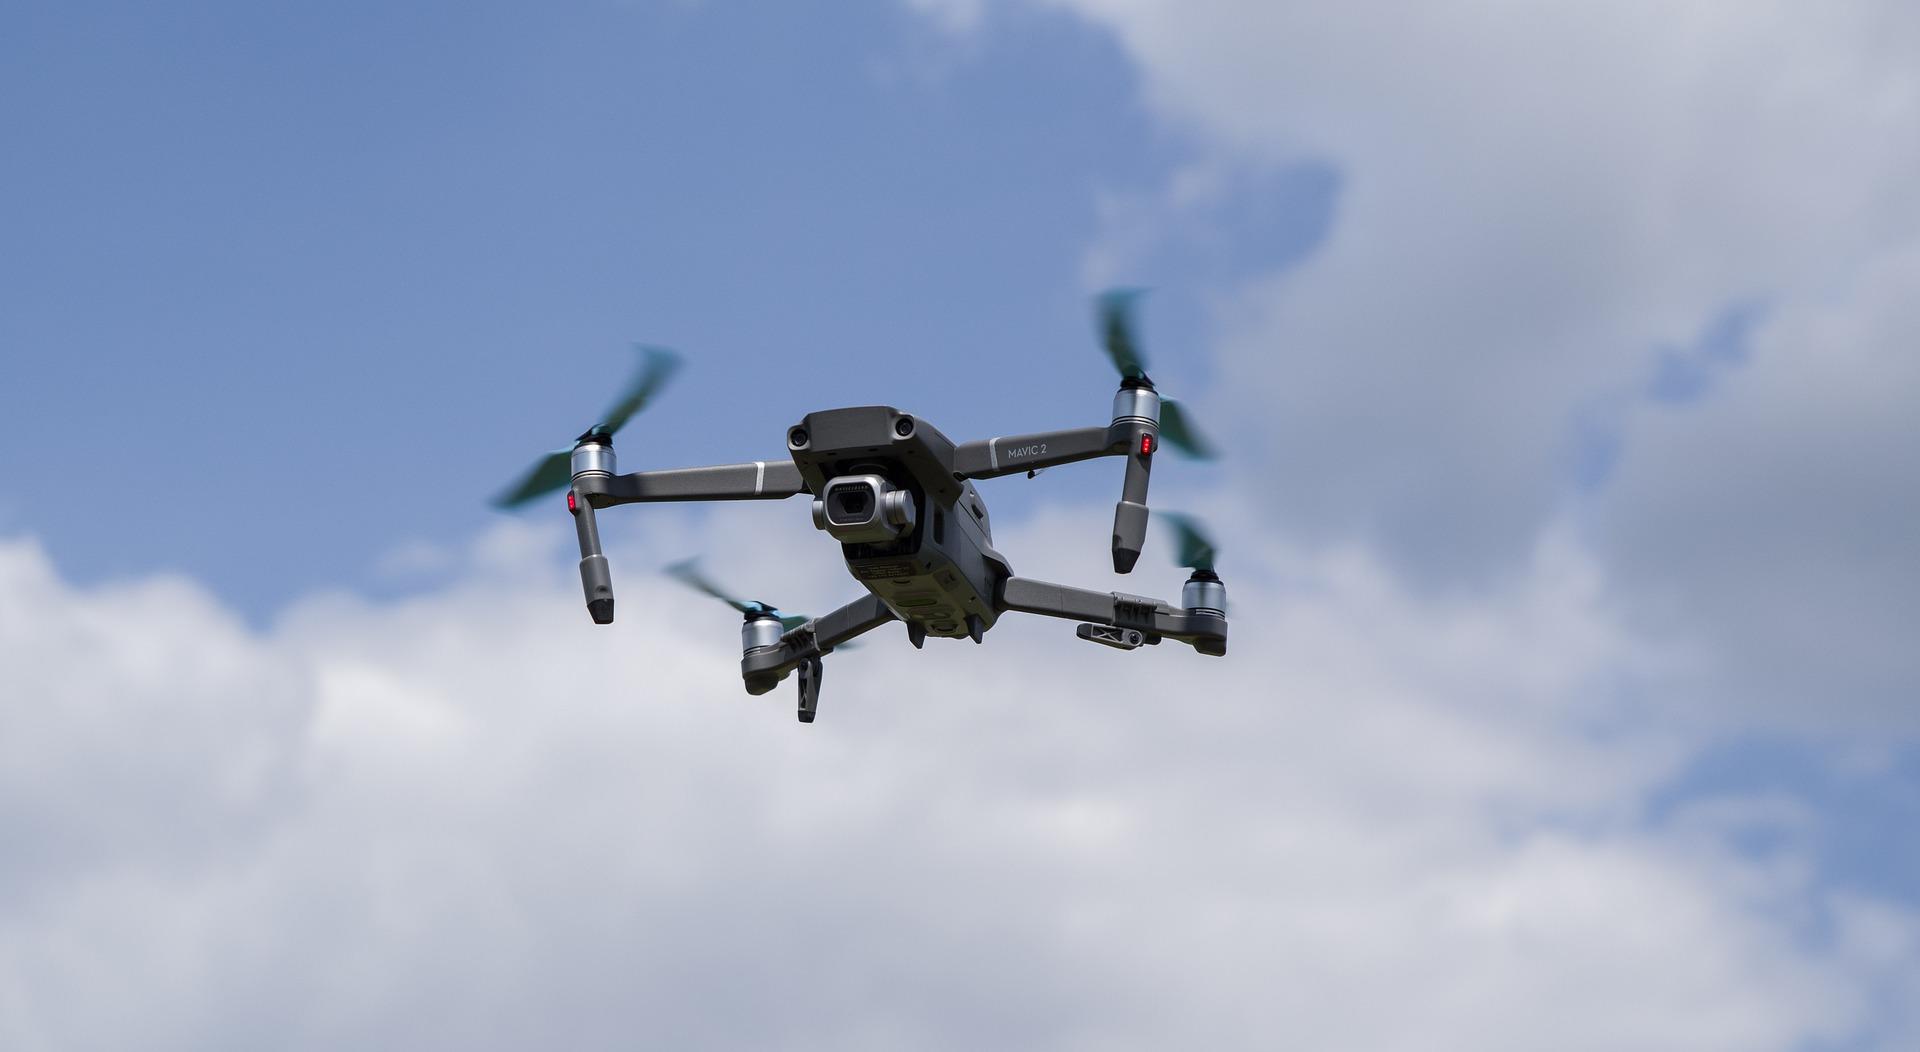 Mail.ru Group устроит шоу дронов над столицей